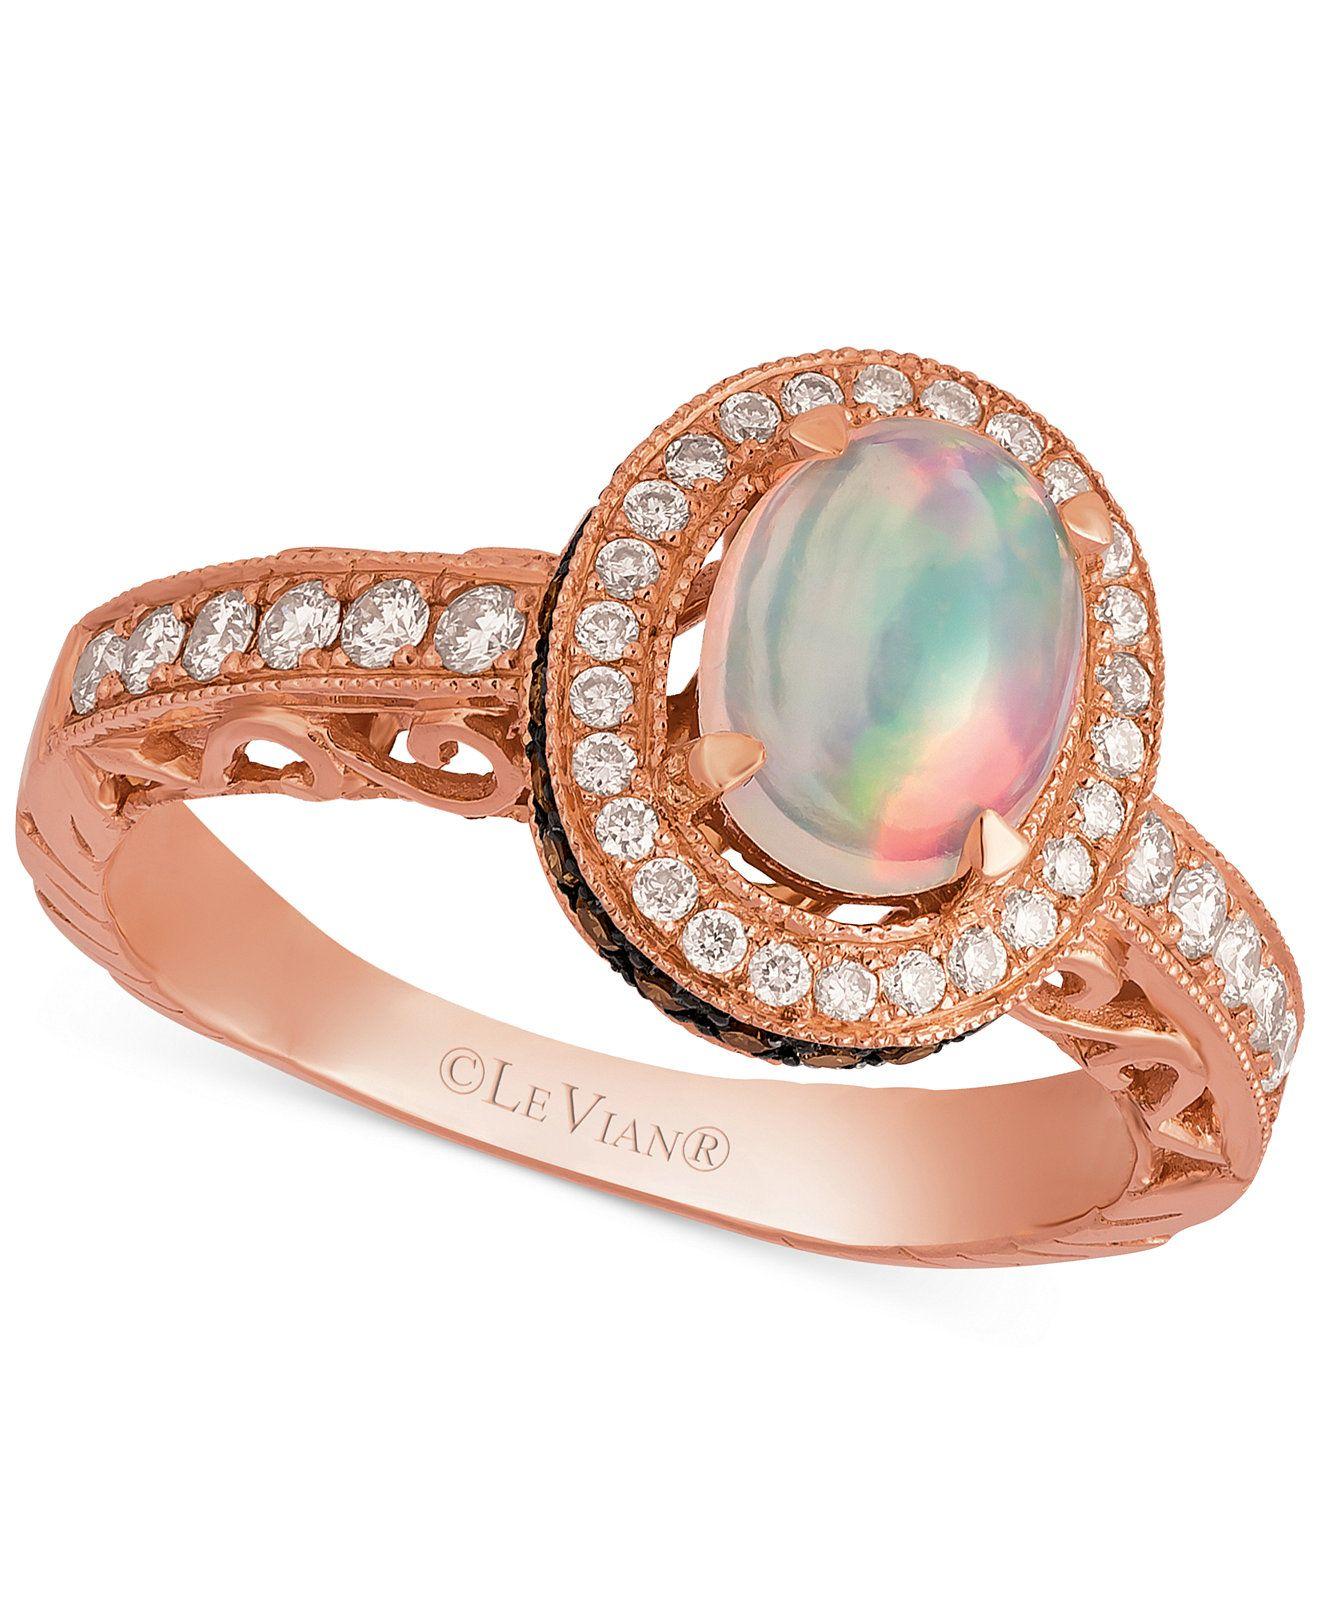 Le Vian Opal 2 3 ct t w and Diamond 5 8 ct t w Ring in 14k